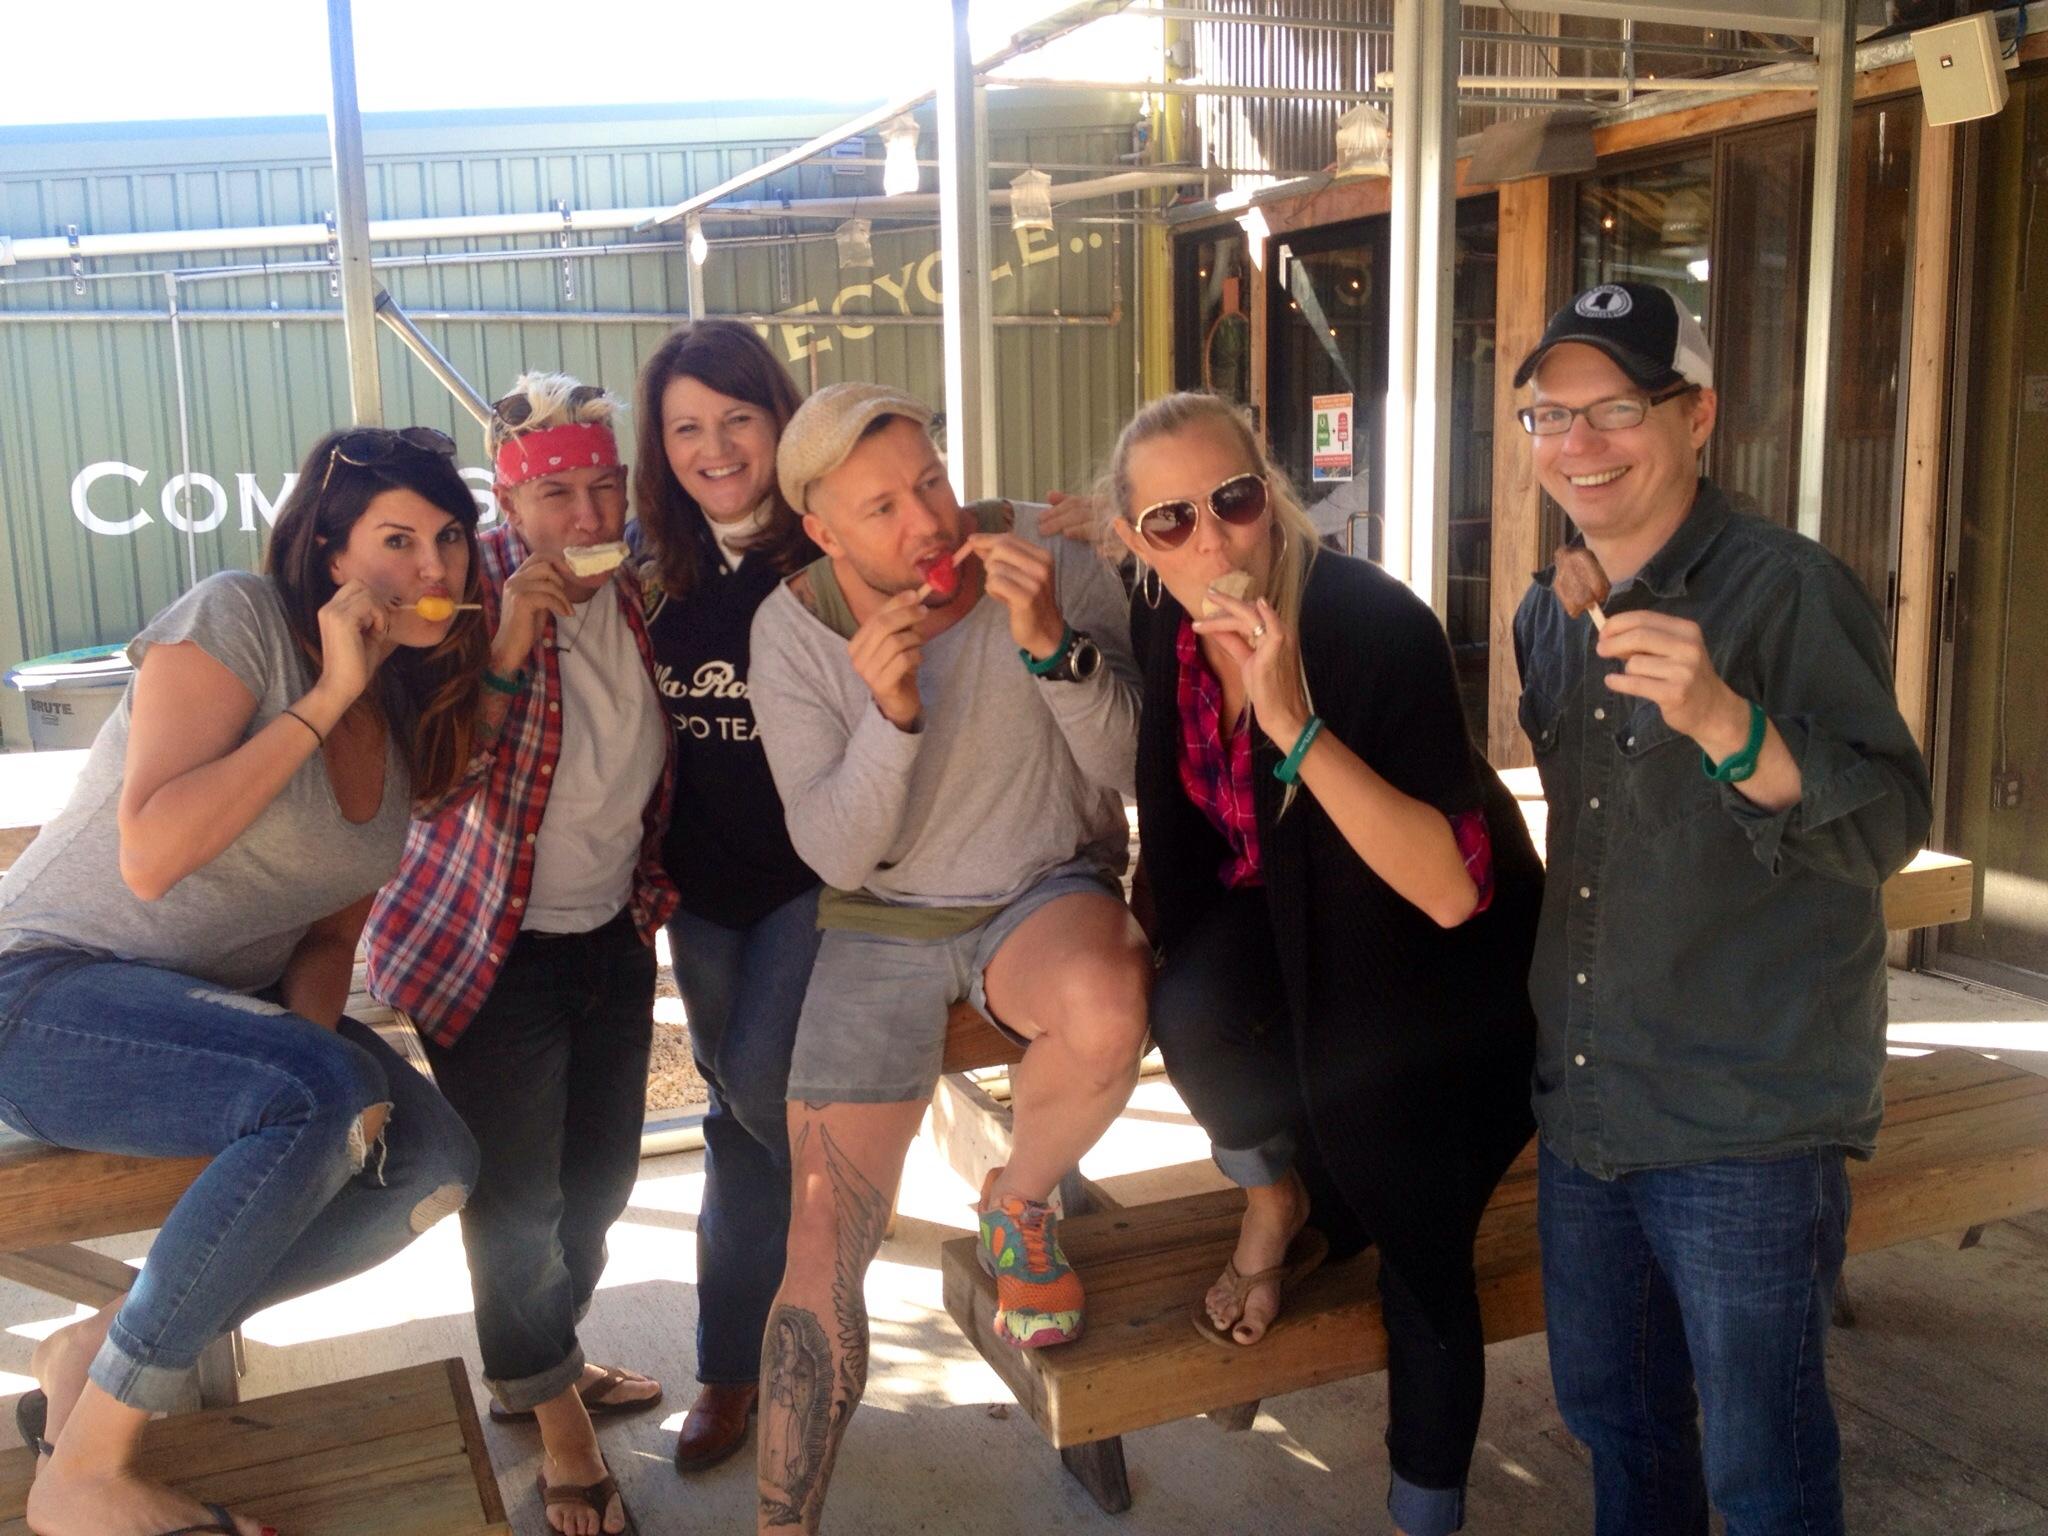 Food Network Stars in Fairhope, Alabama Frios Popsicles